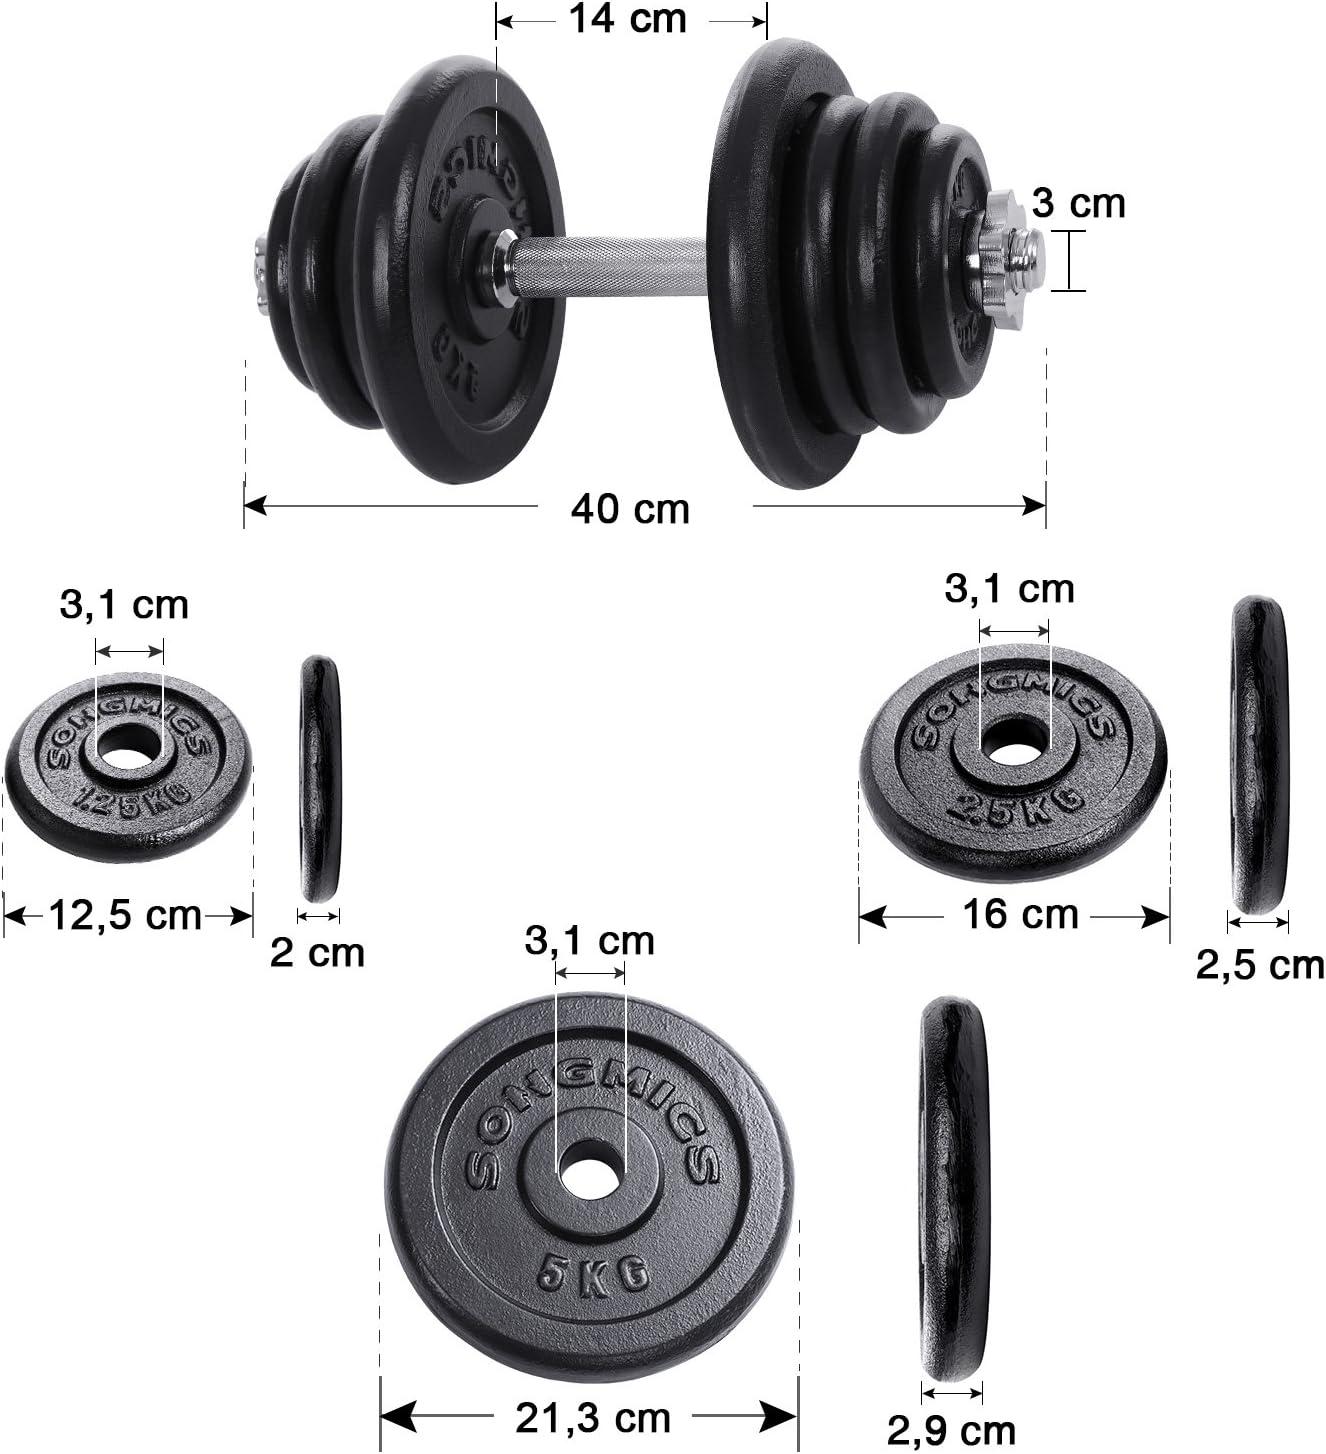 SONGMICS Dumbbell Weight Set Cast Iron 20KG 30KG 40KG 50KG 60KG